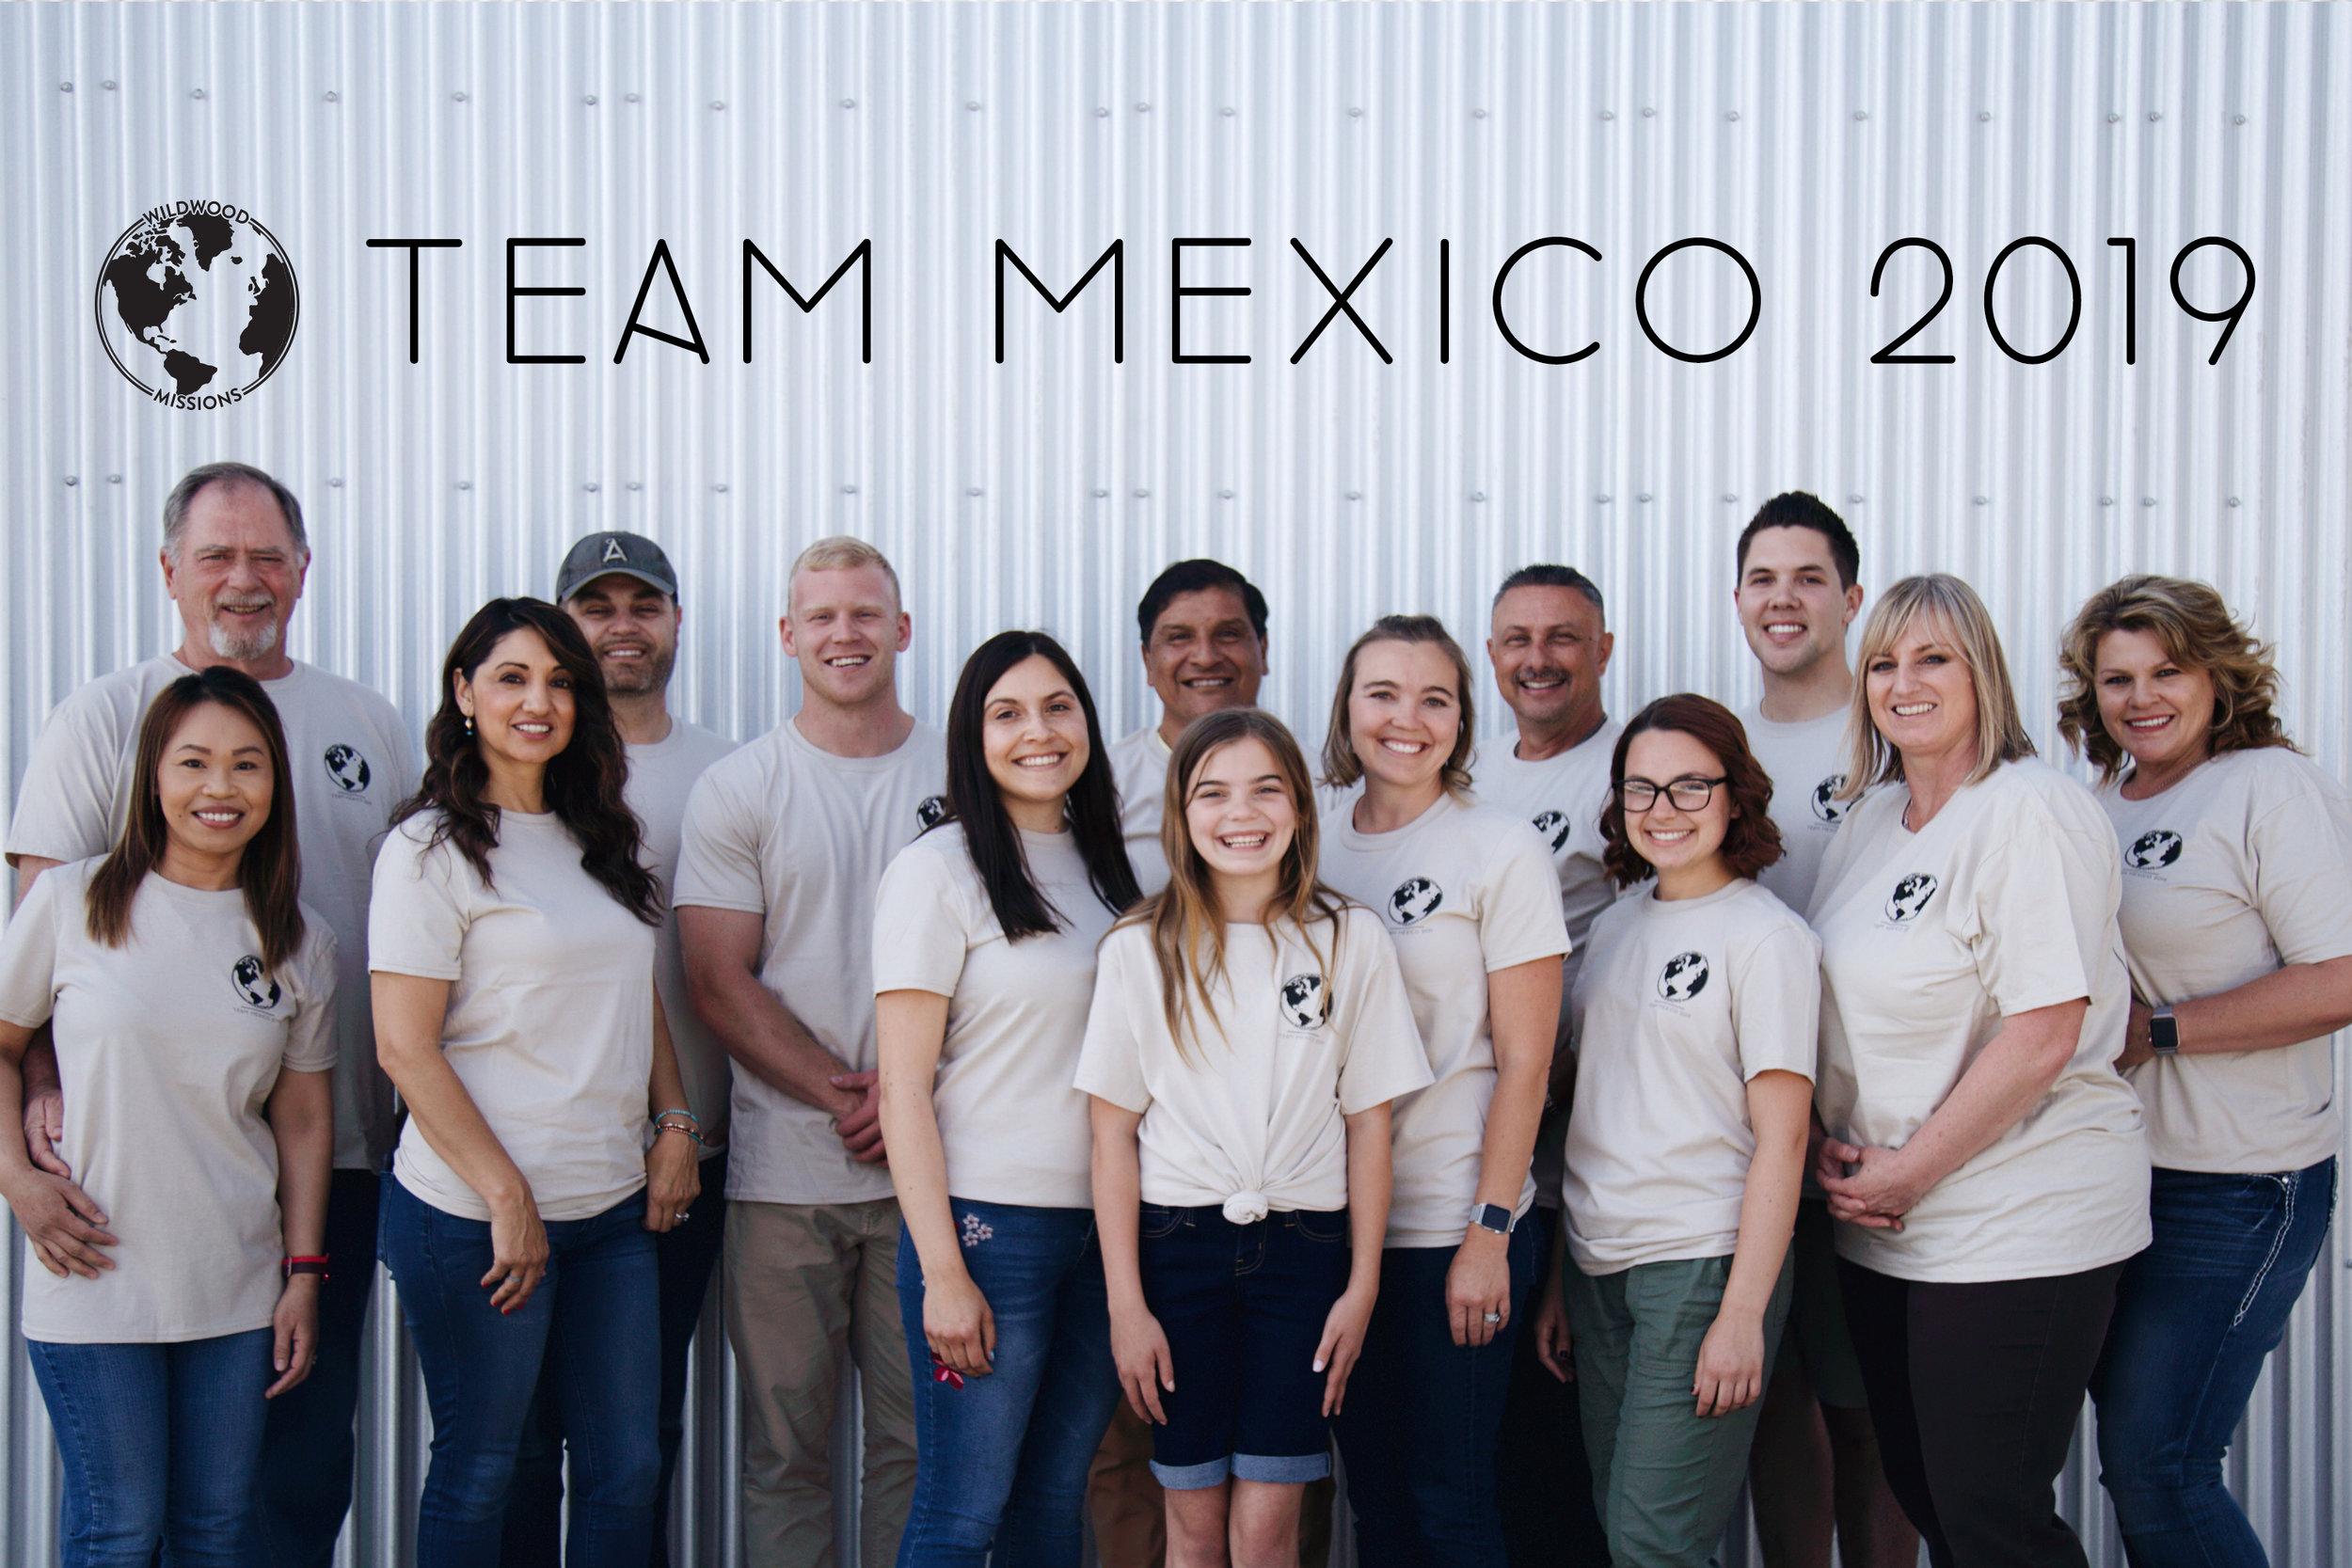 teammexico2019.jpg